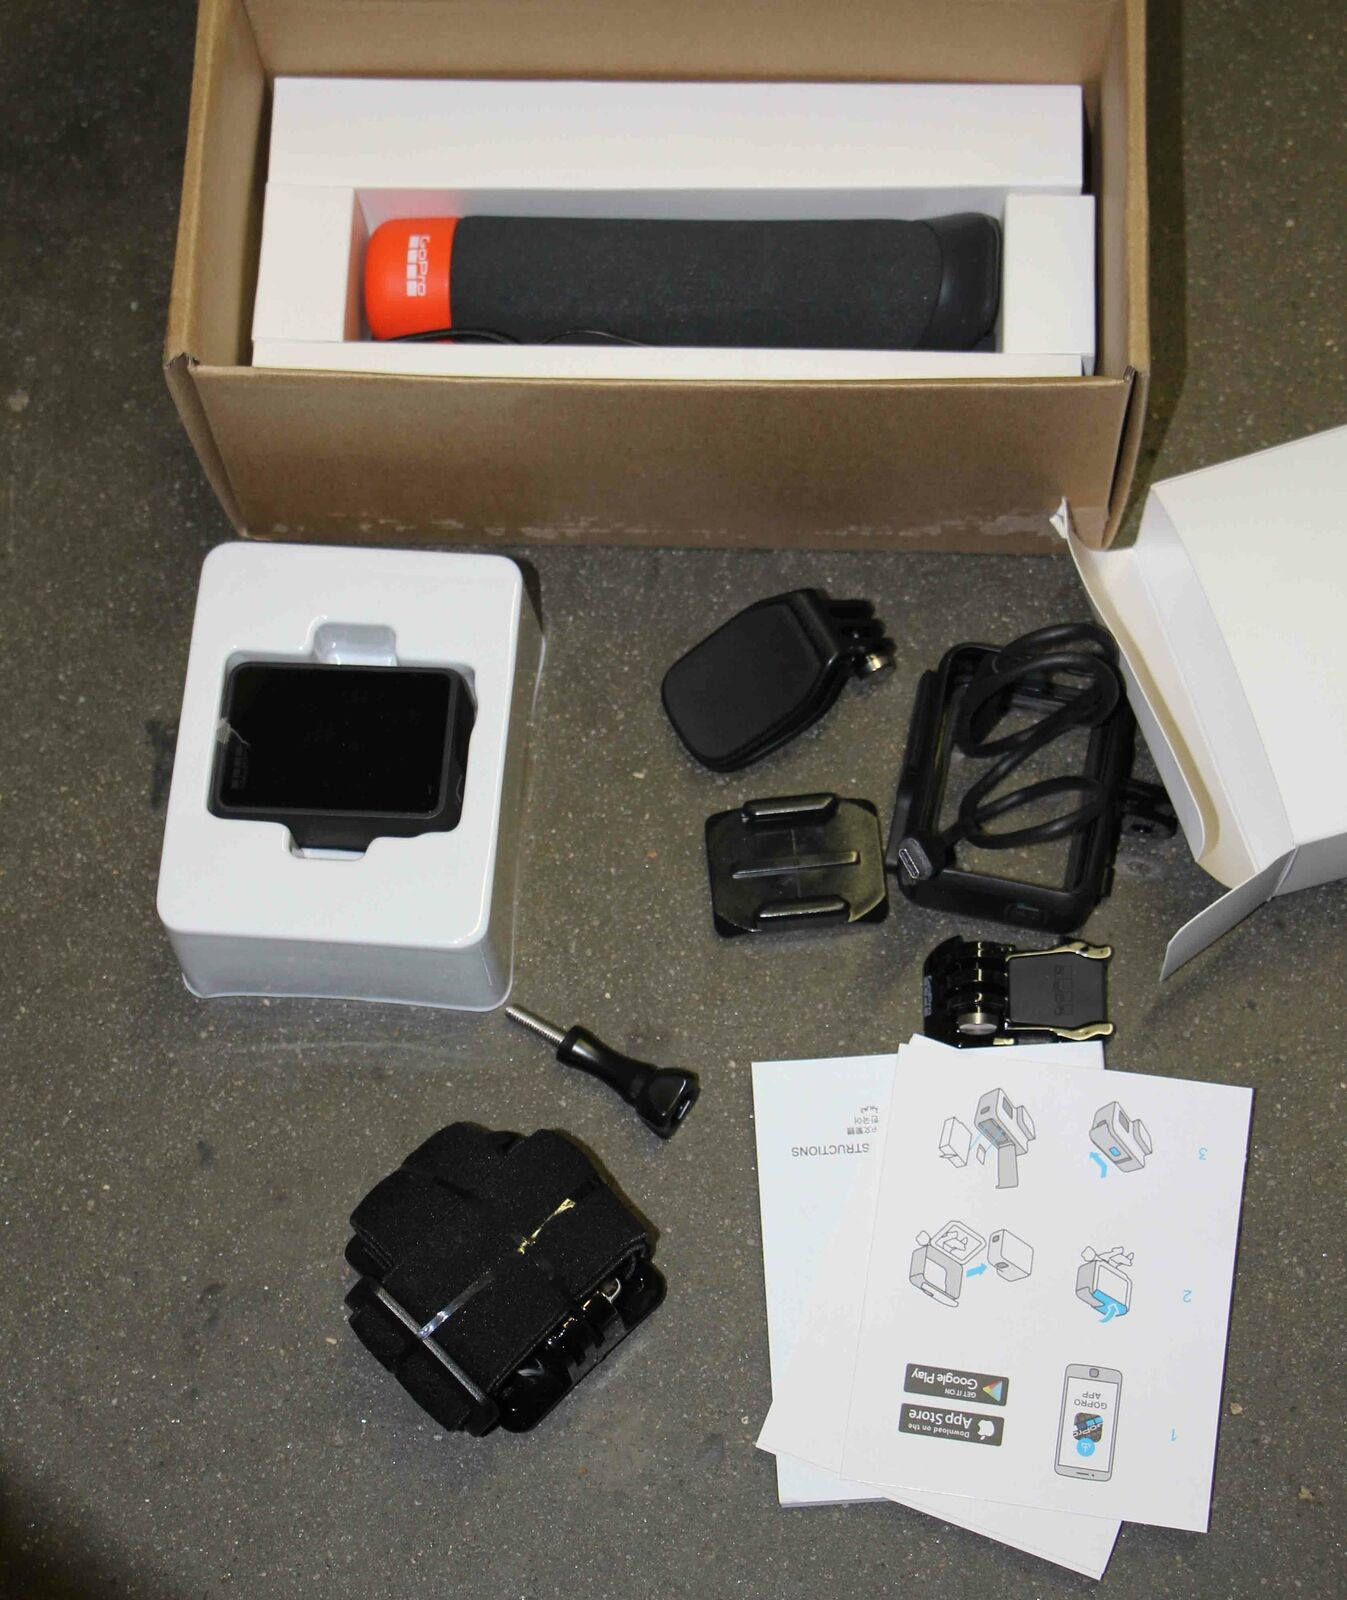 NEW GoPro HERO7 Black 4K Waterproof Action Camera with Accessories Bundle accessories action black bundle camera gopro hero7 new waterproof with